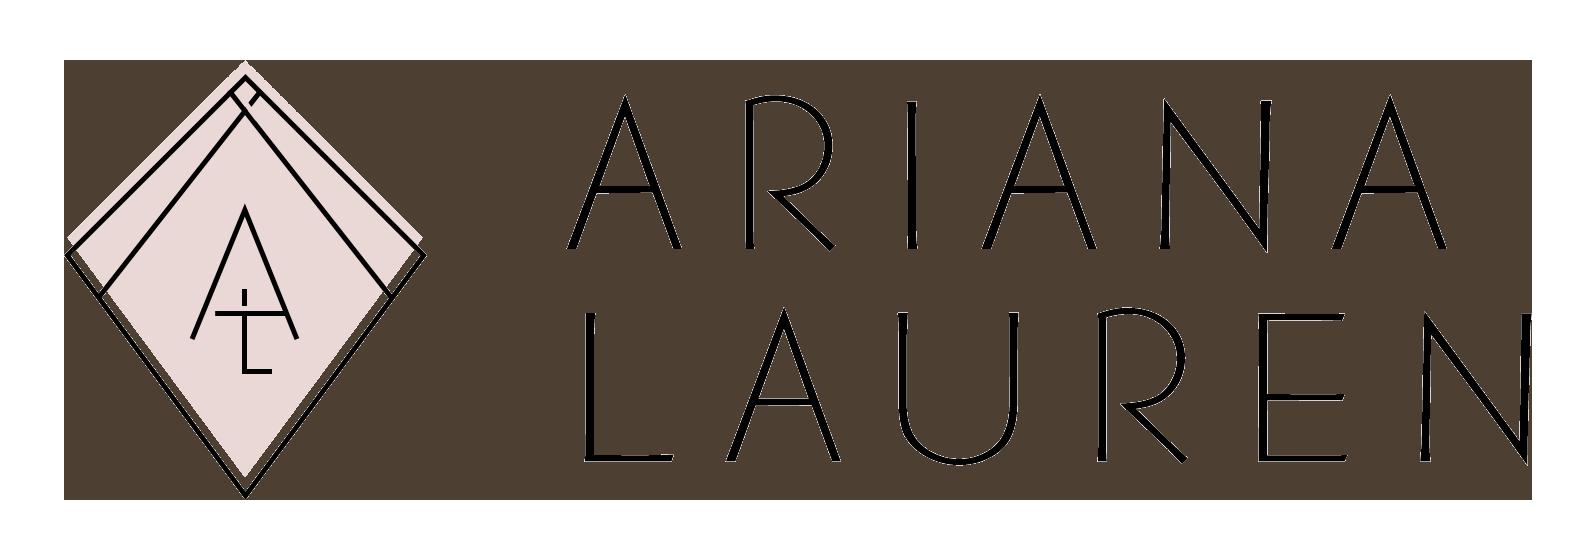 Ariana Lauren